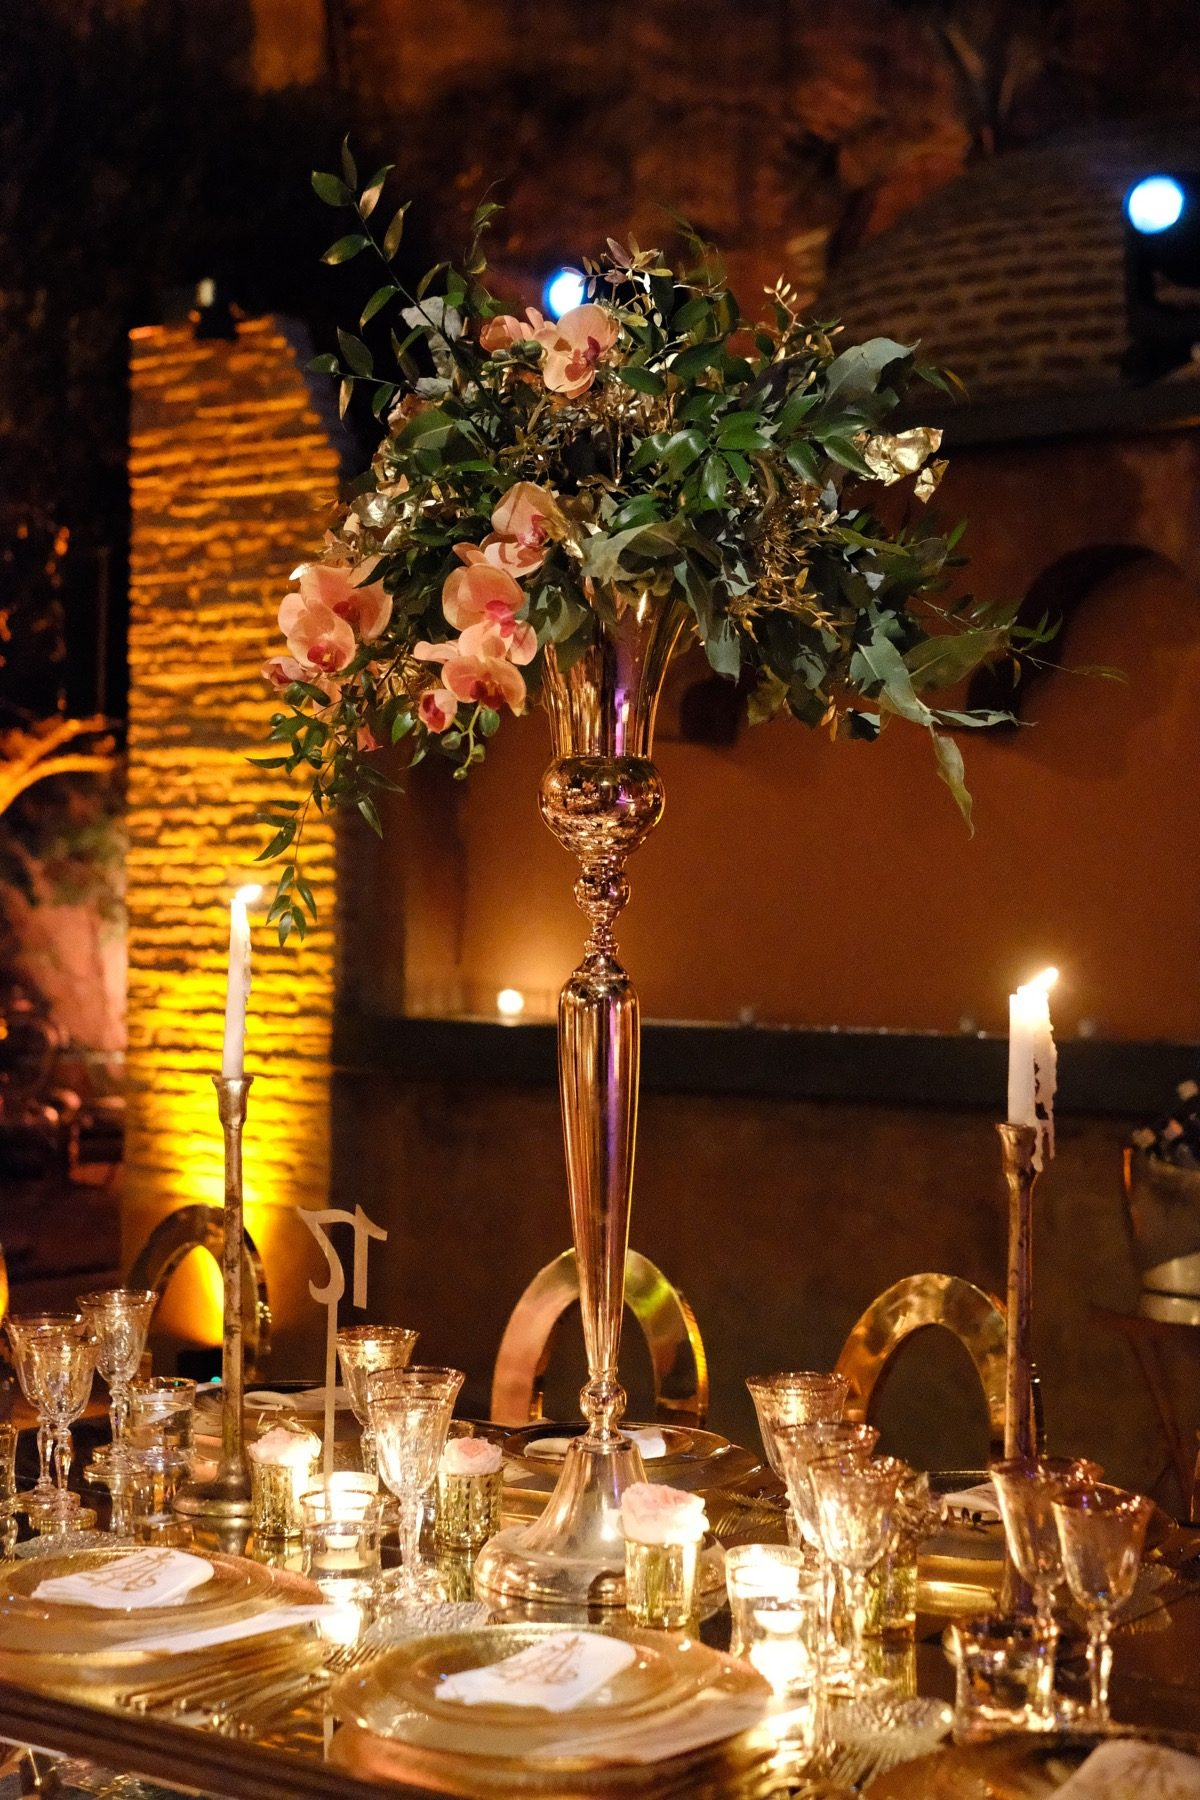 Si-Quiero-Wedding-Planner-By-Sira-Antequera-Bodas-Málaga-Marbella-Miami- L-A-42